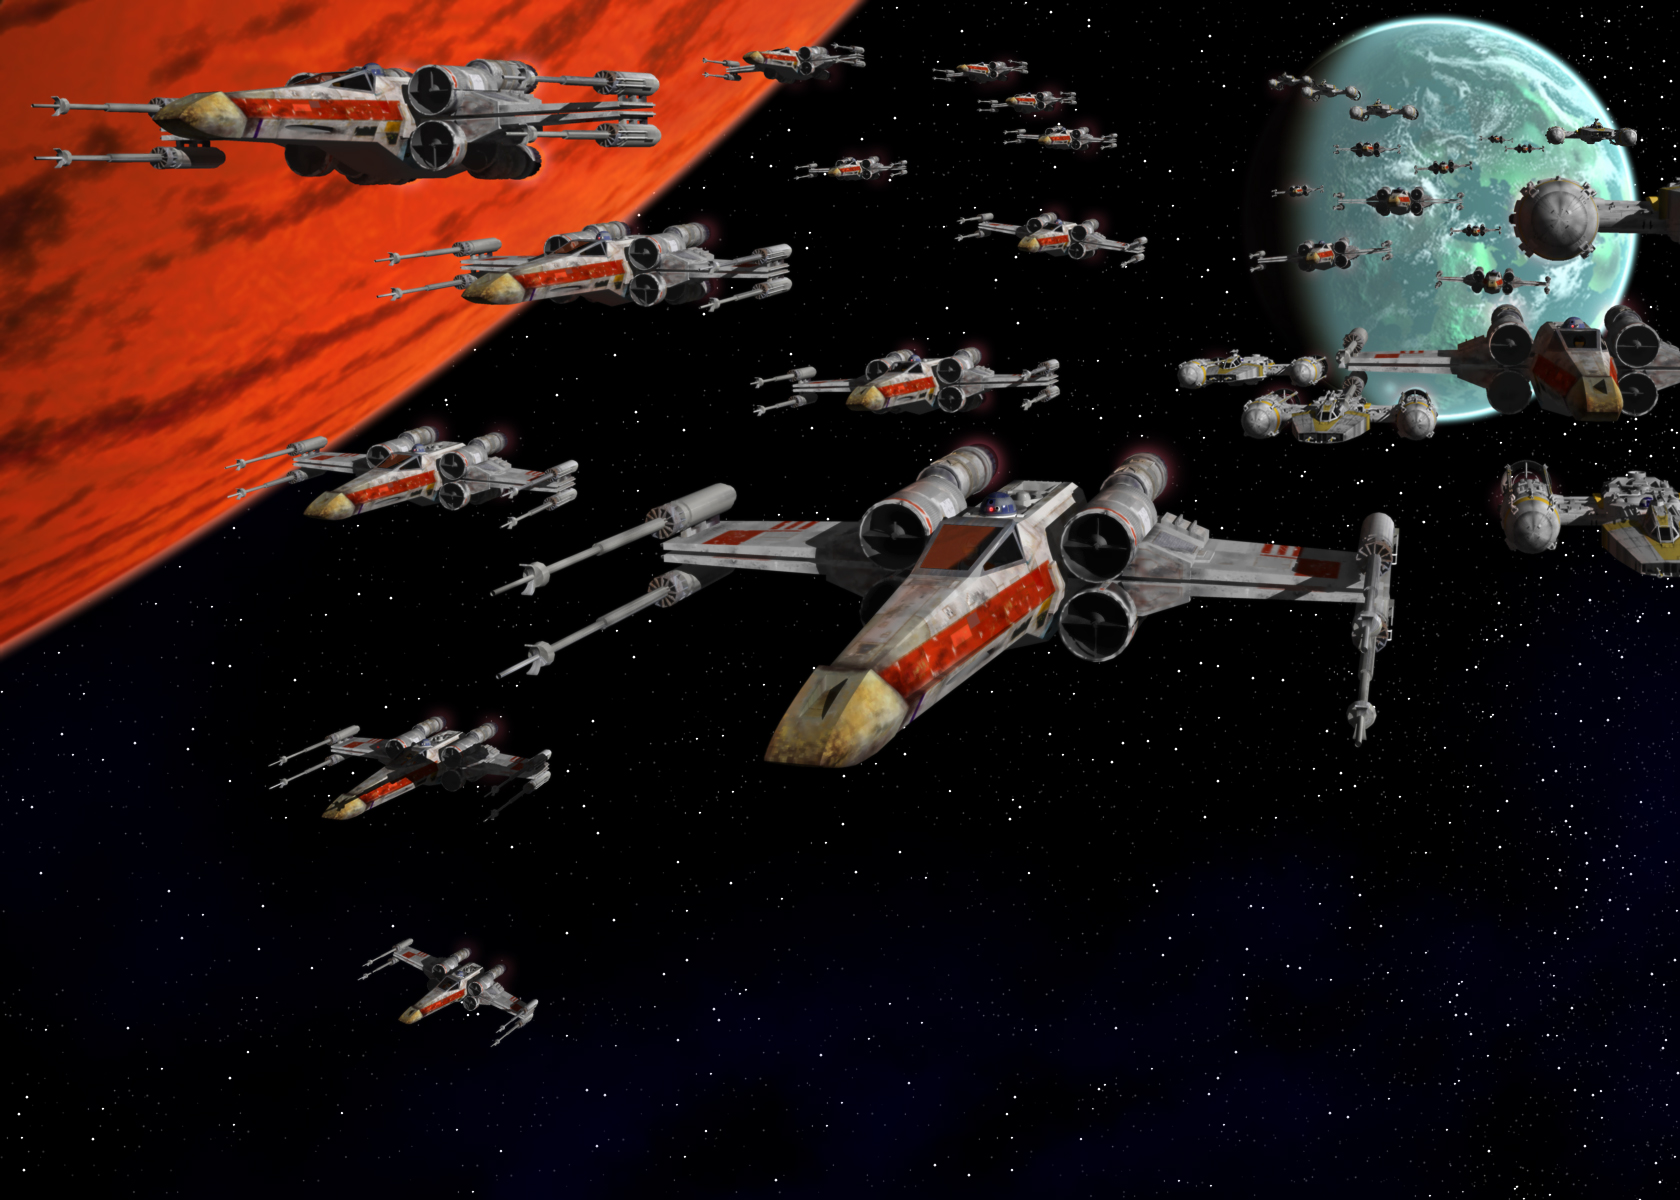 Free Download Star Wars X Wing Planets Fleet Hd Wallpaper Movies Tv 228598 1680x1200 For Your Desktop Mobile Tablet Explore 42 Hd X Wing Wallpaper X Men Movie Wallpaper